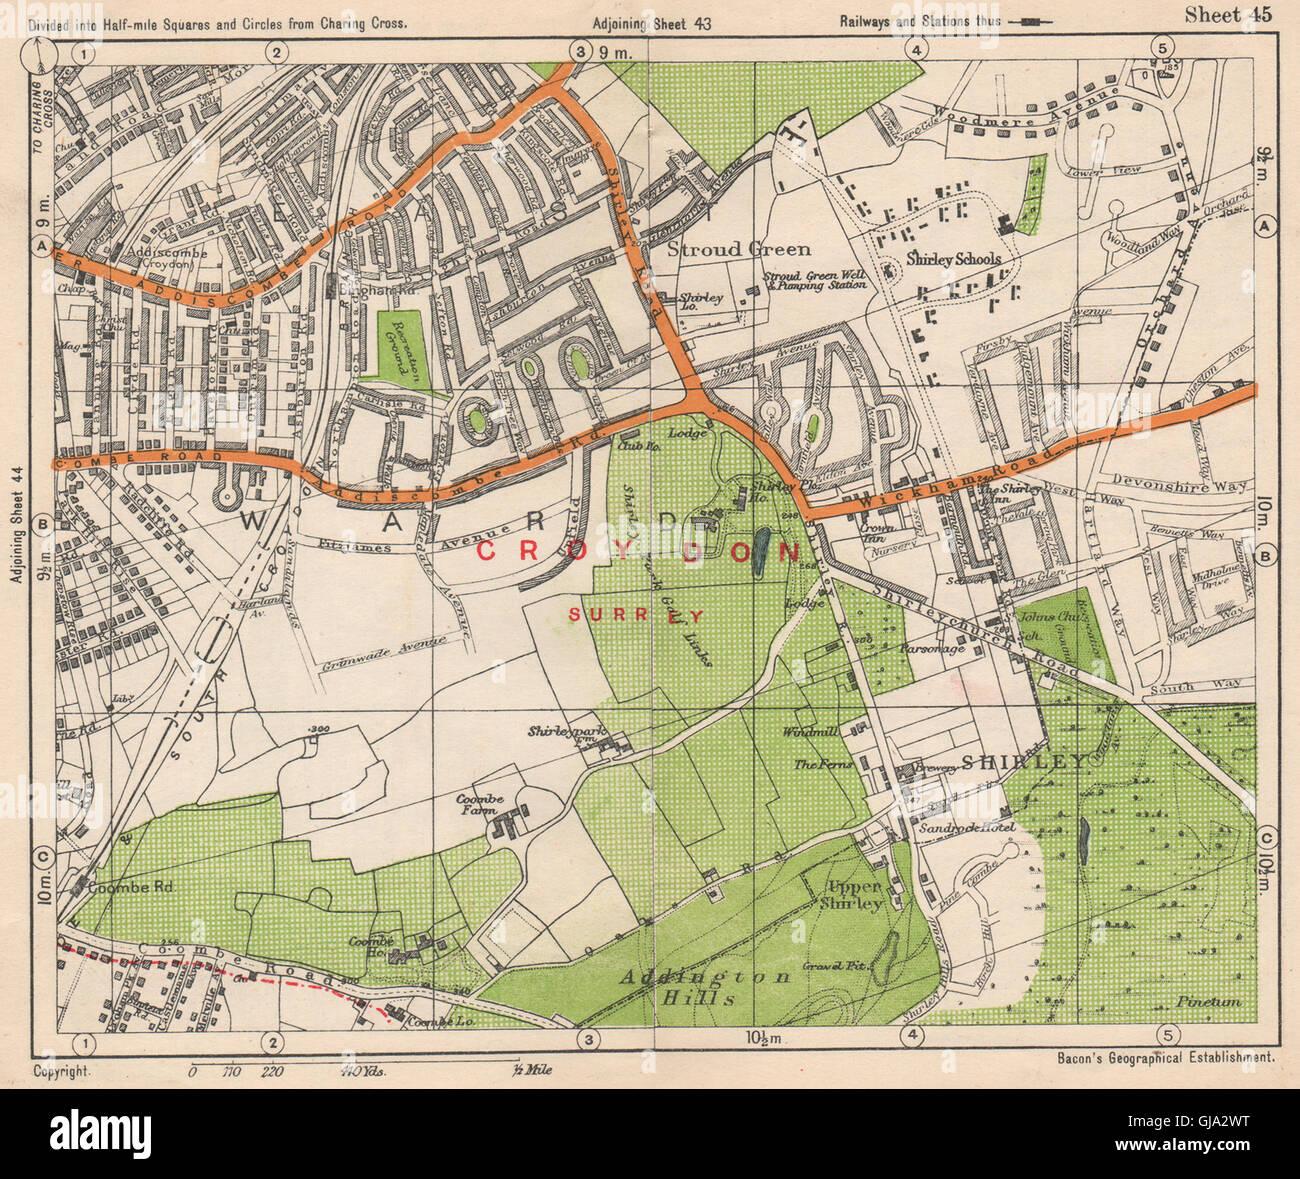 Map South East London.South East London Shirley Addiscombe E Croydon Stroud Green Bacon